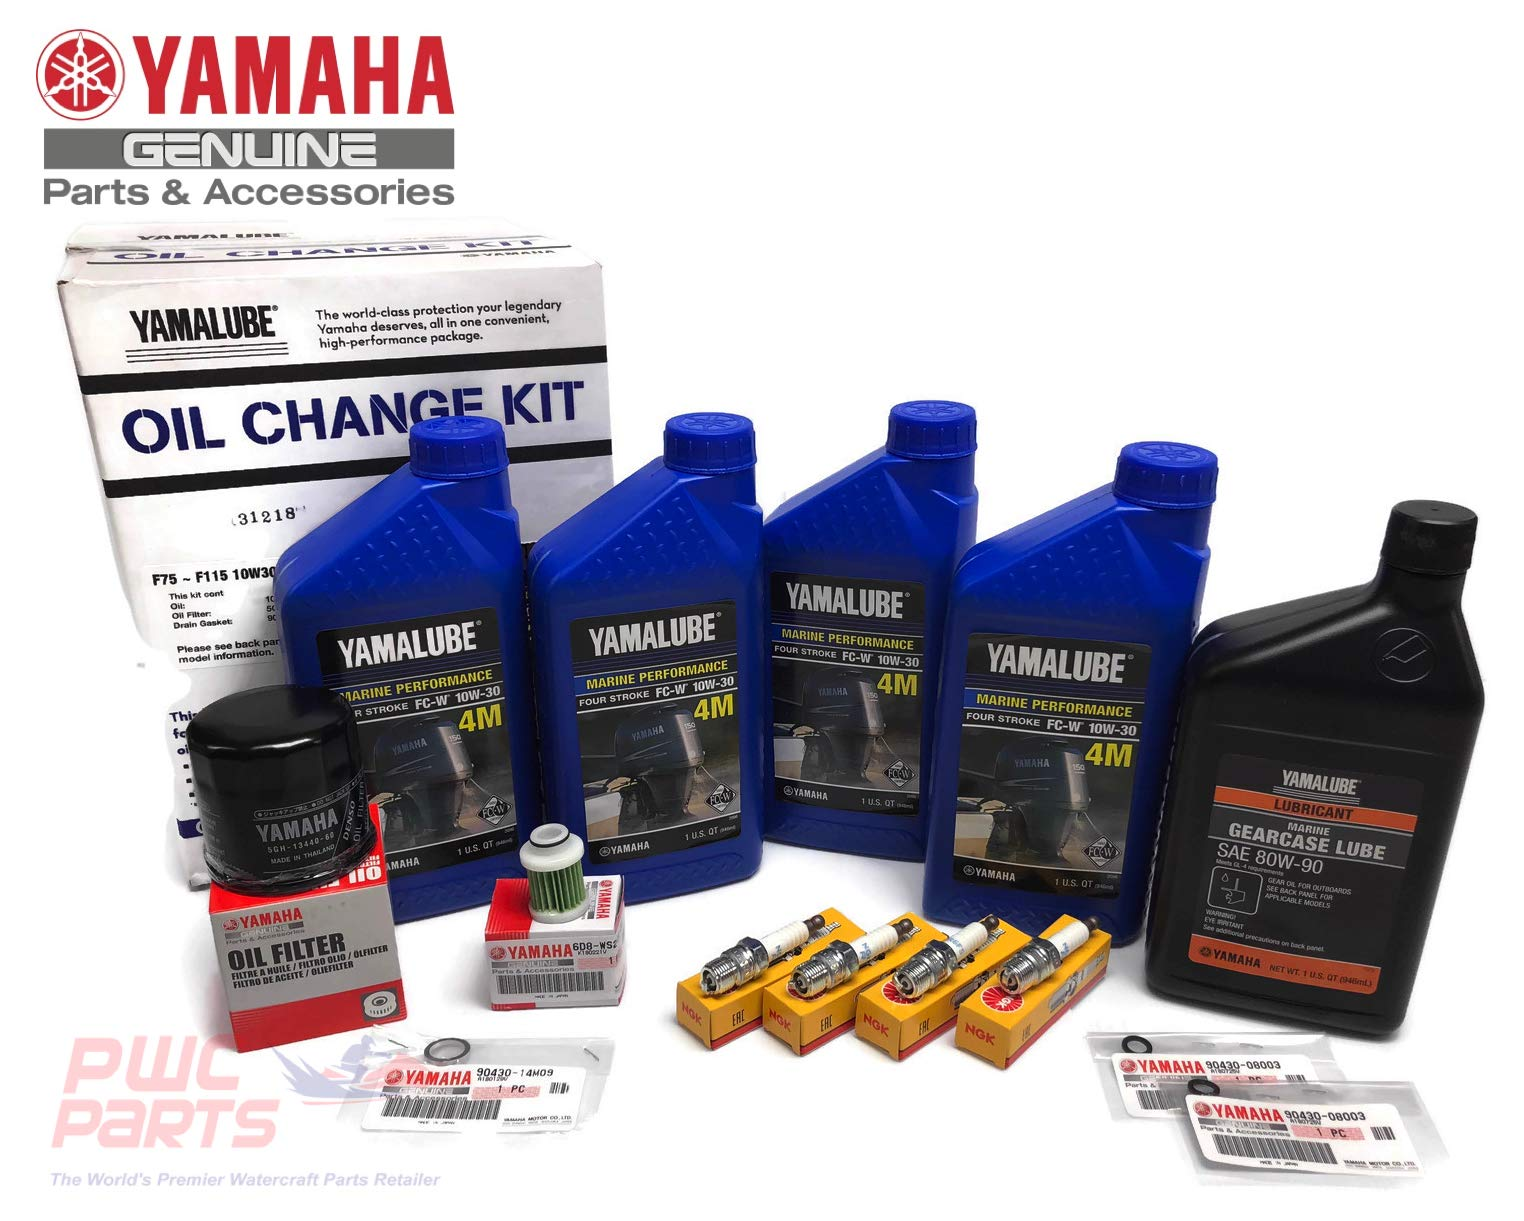 YAMAHA 2000-2005 F115 Oil Change 10W30 FC 4M Lower Unit Gear Lube Drain Fill Gasket NGK Spark Plugs LFR6A-11 Maintenance Kit